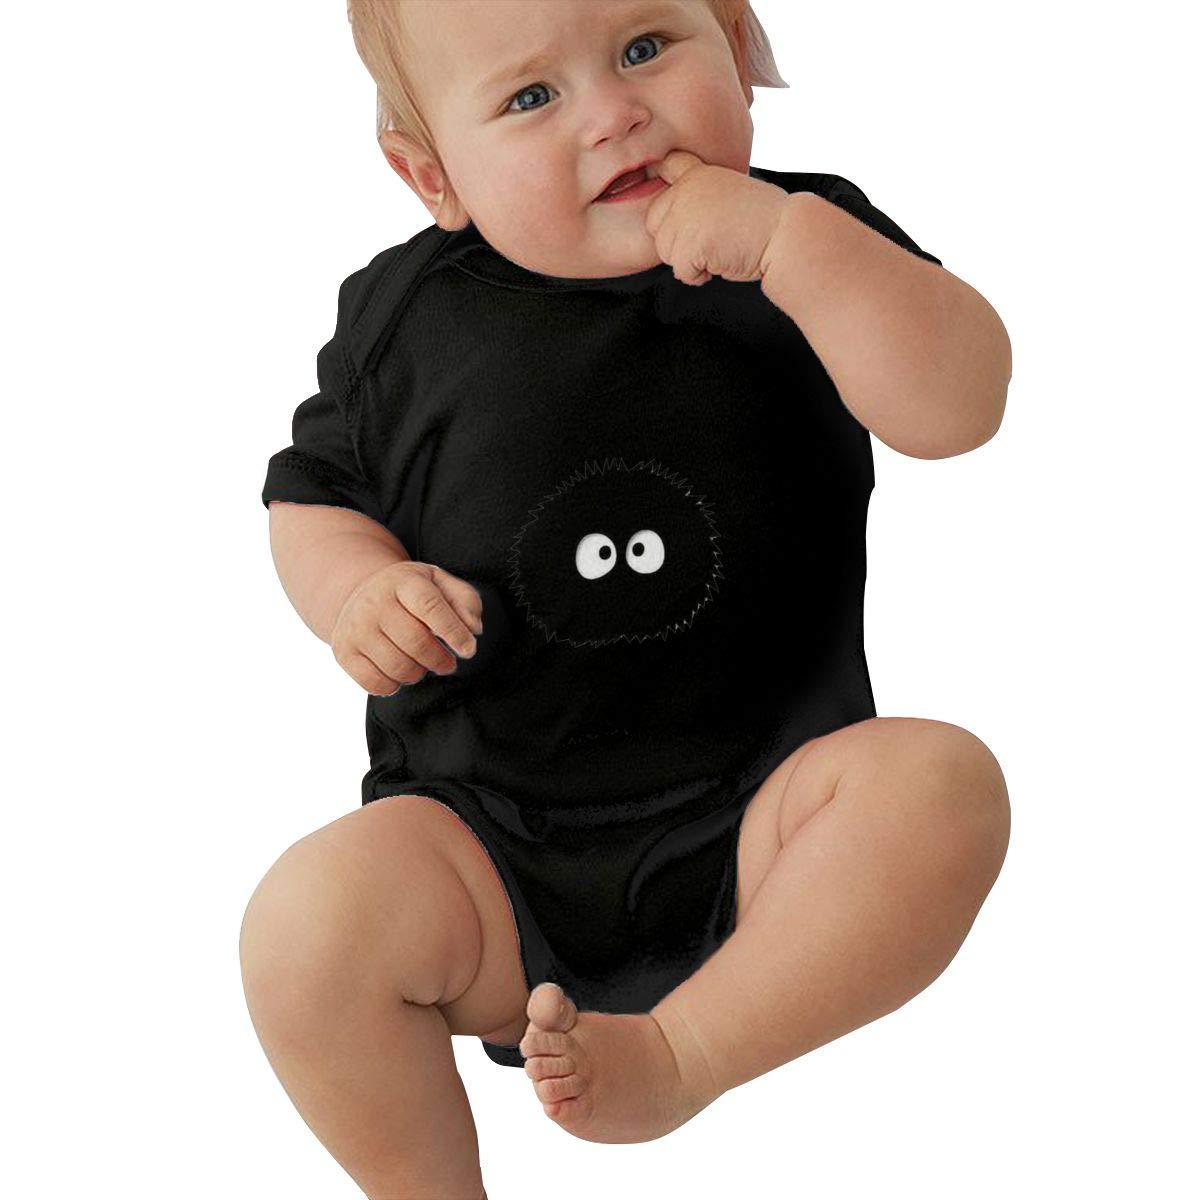 LOUHART Unisex Baby Round Neck Short Sleeve Onesie Spirited Away Funny Crawling Clothes Black